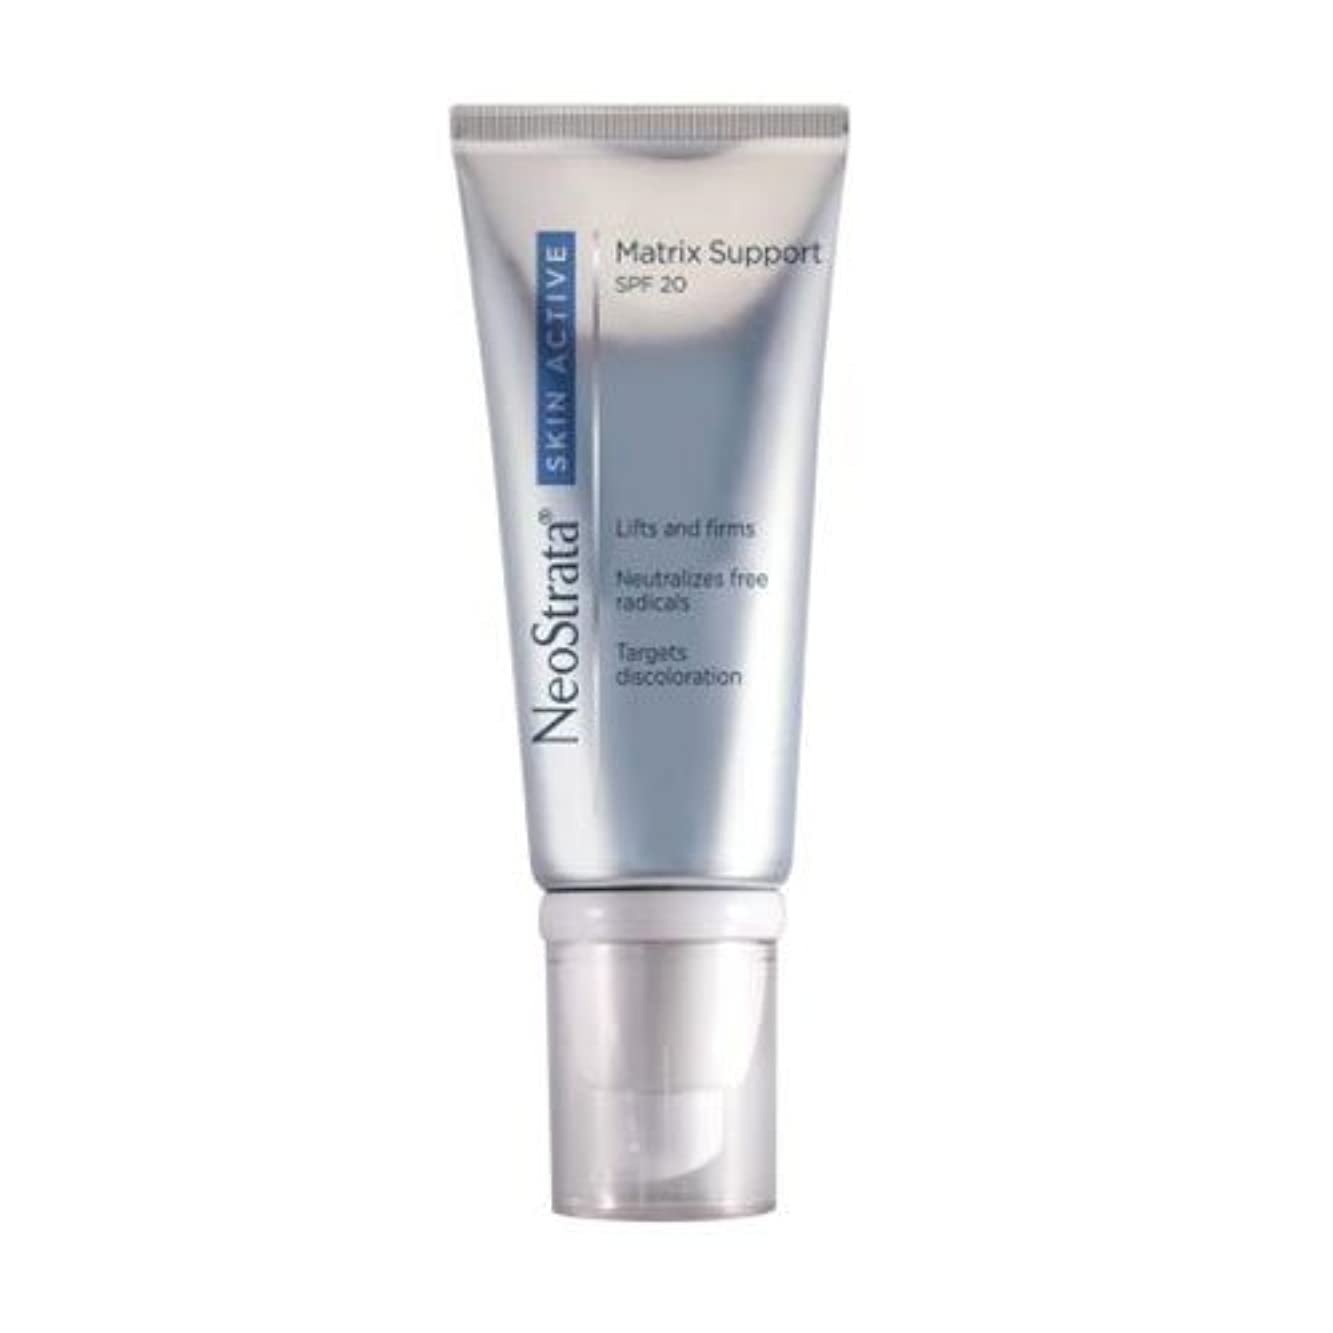 Neostrata Skin Active Matrix Support Spf30 50ml [並行輸入品]